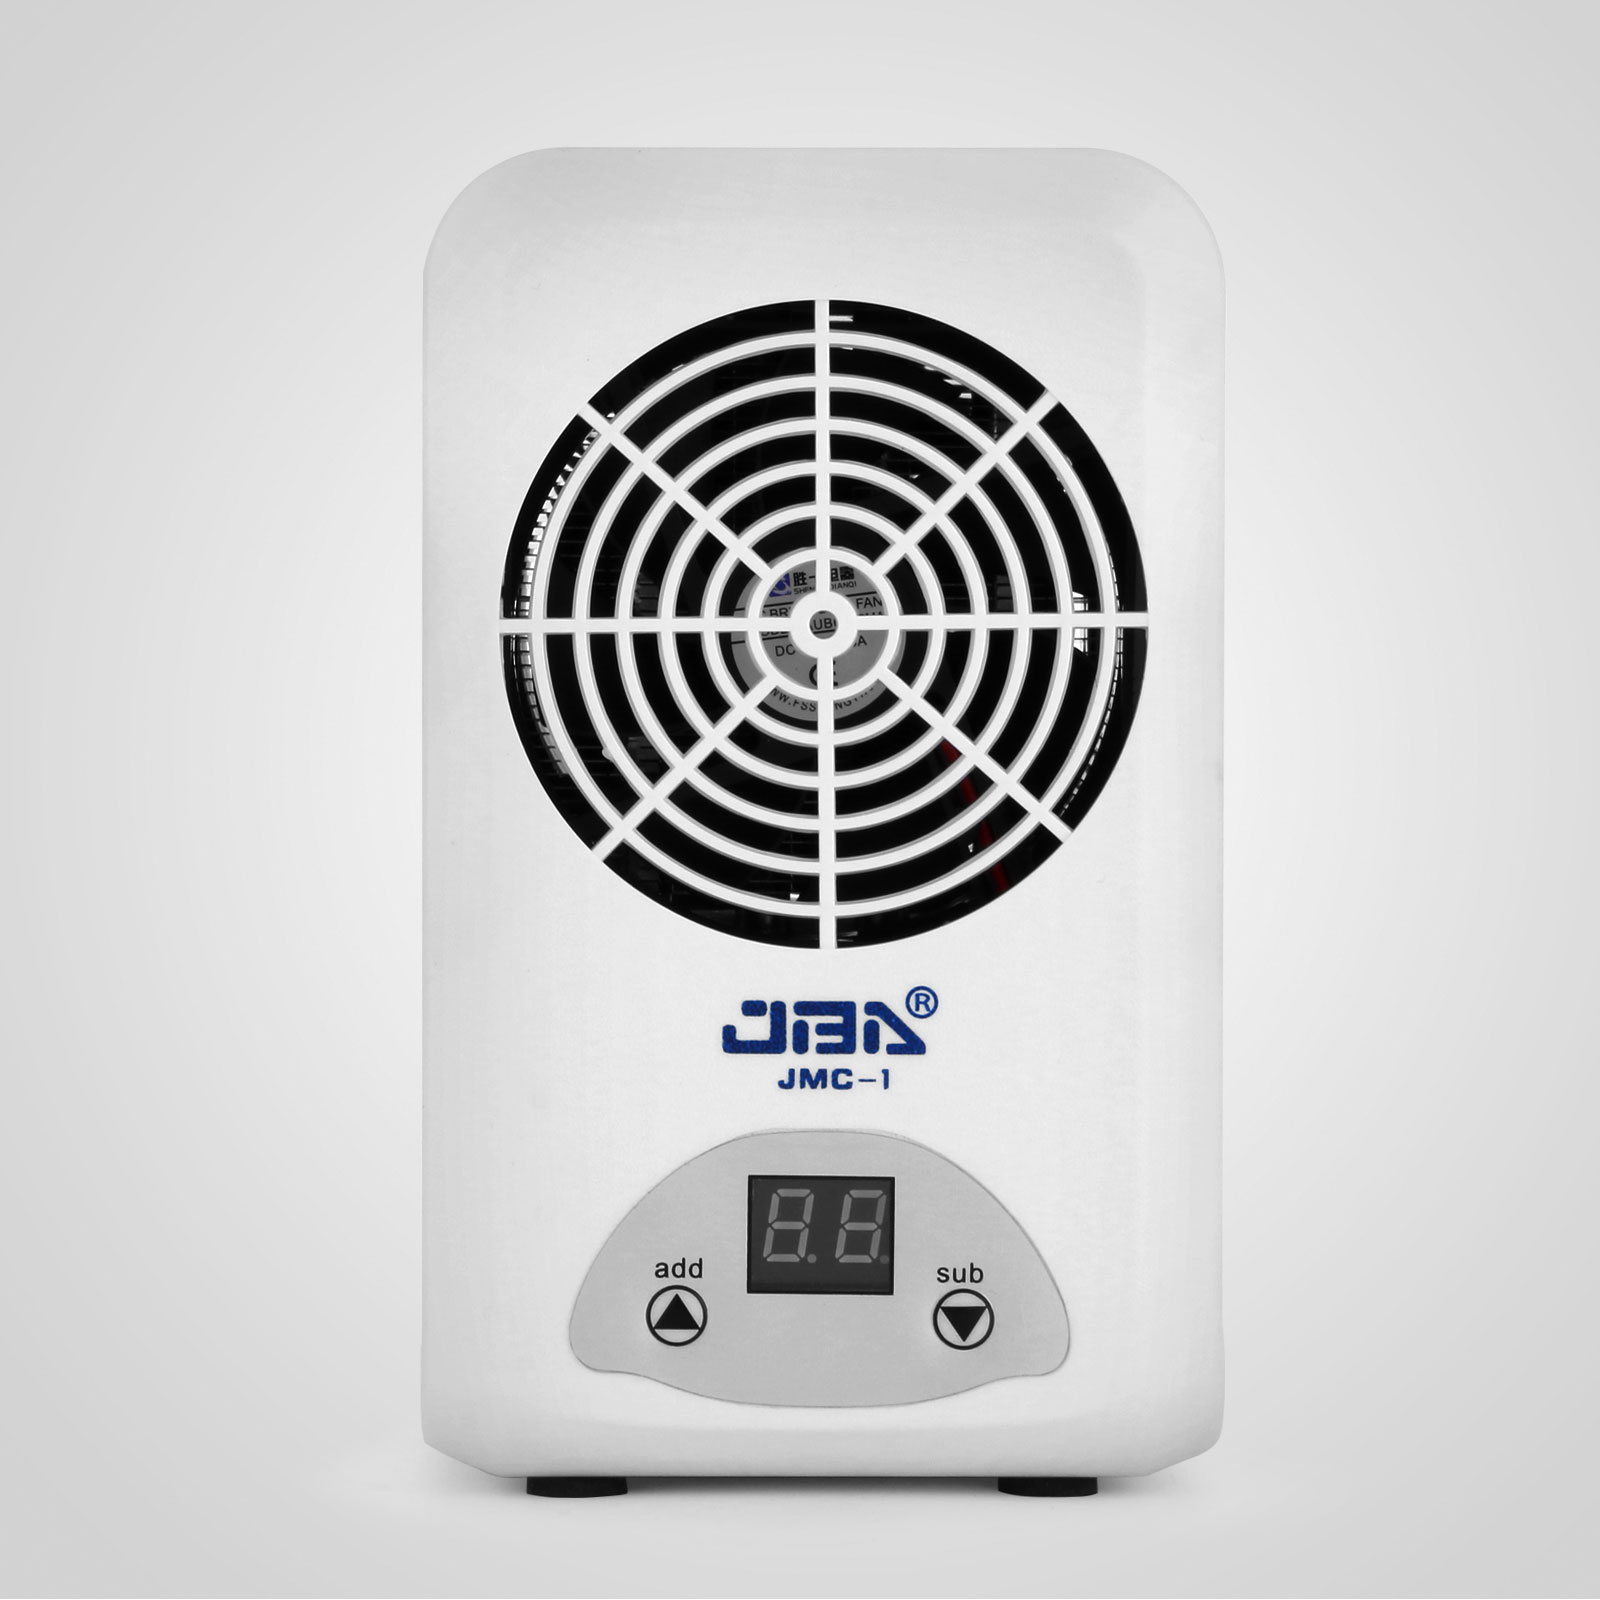 70 108w Thermostatic Water Heater Chiller Fsih Tank Digital Display